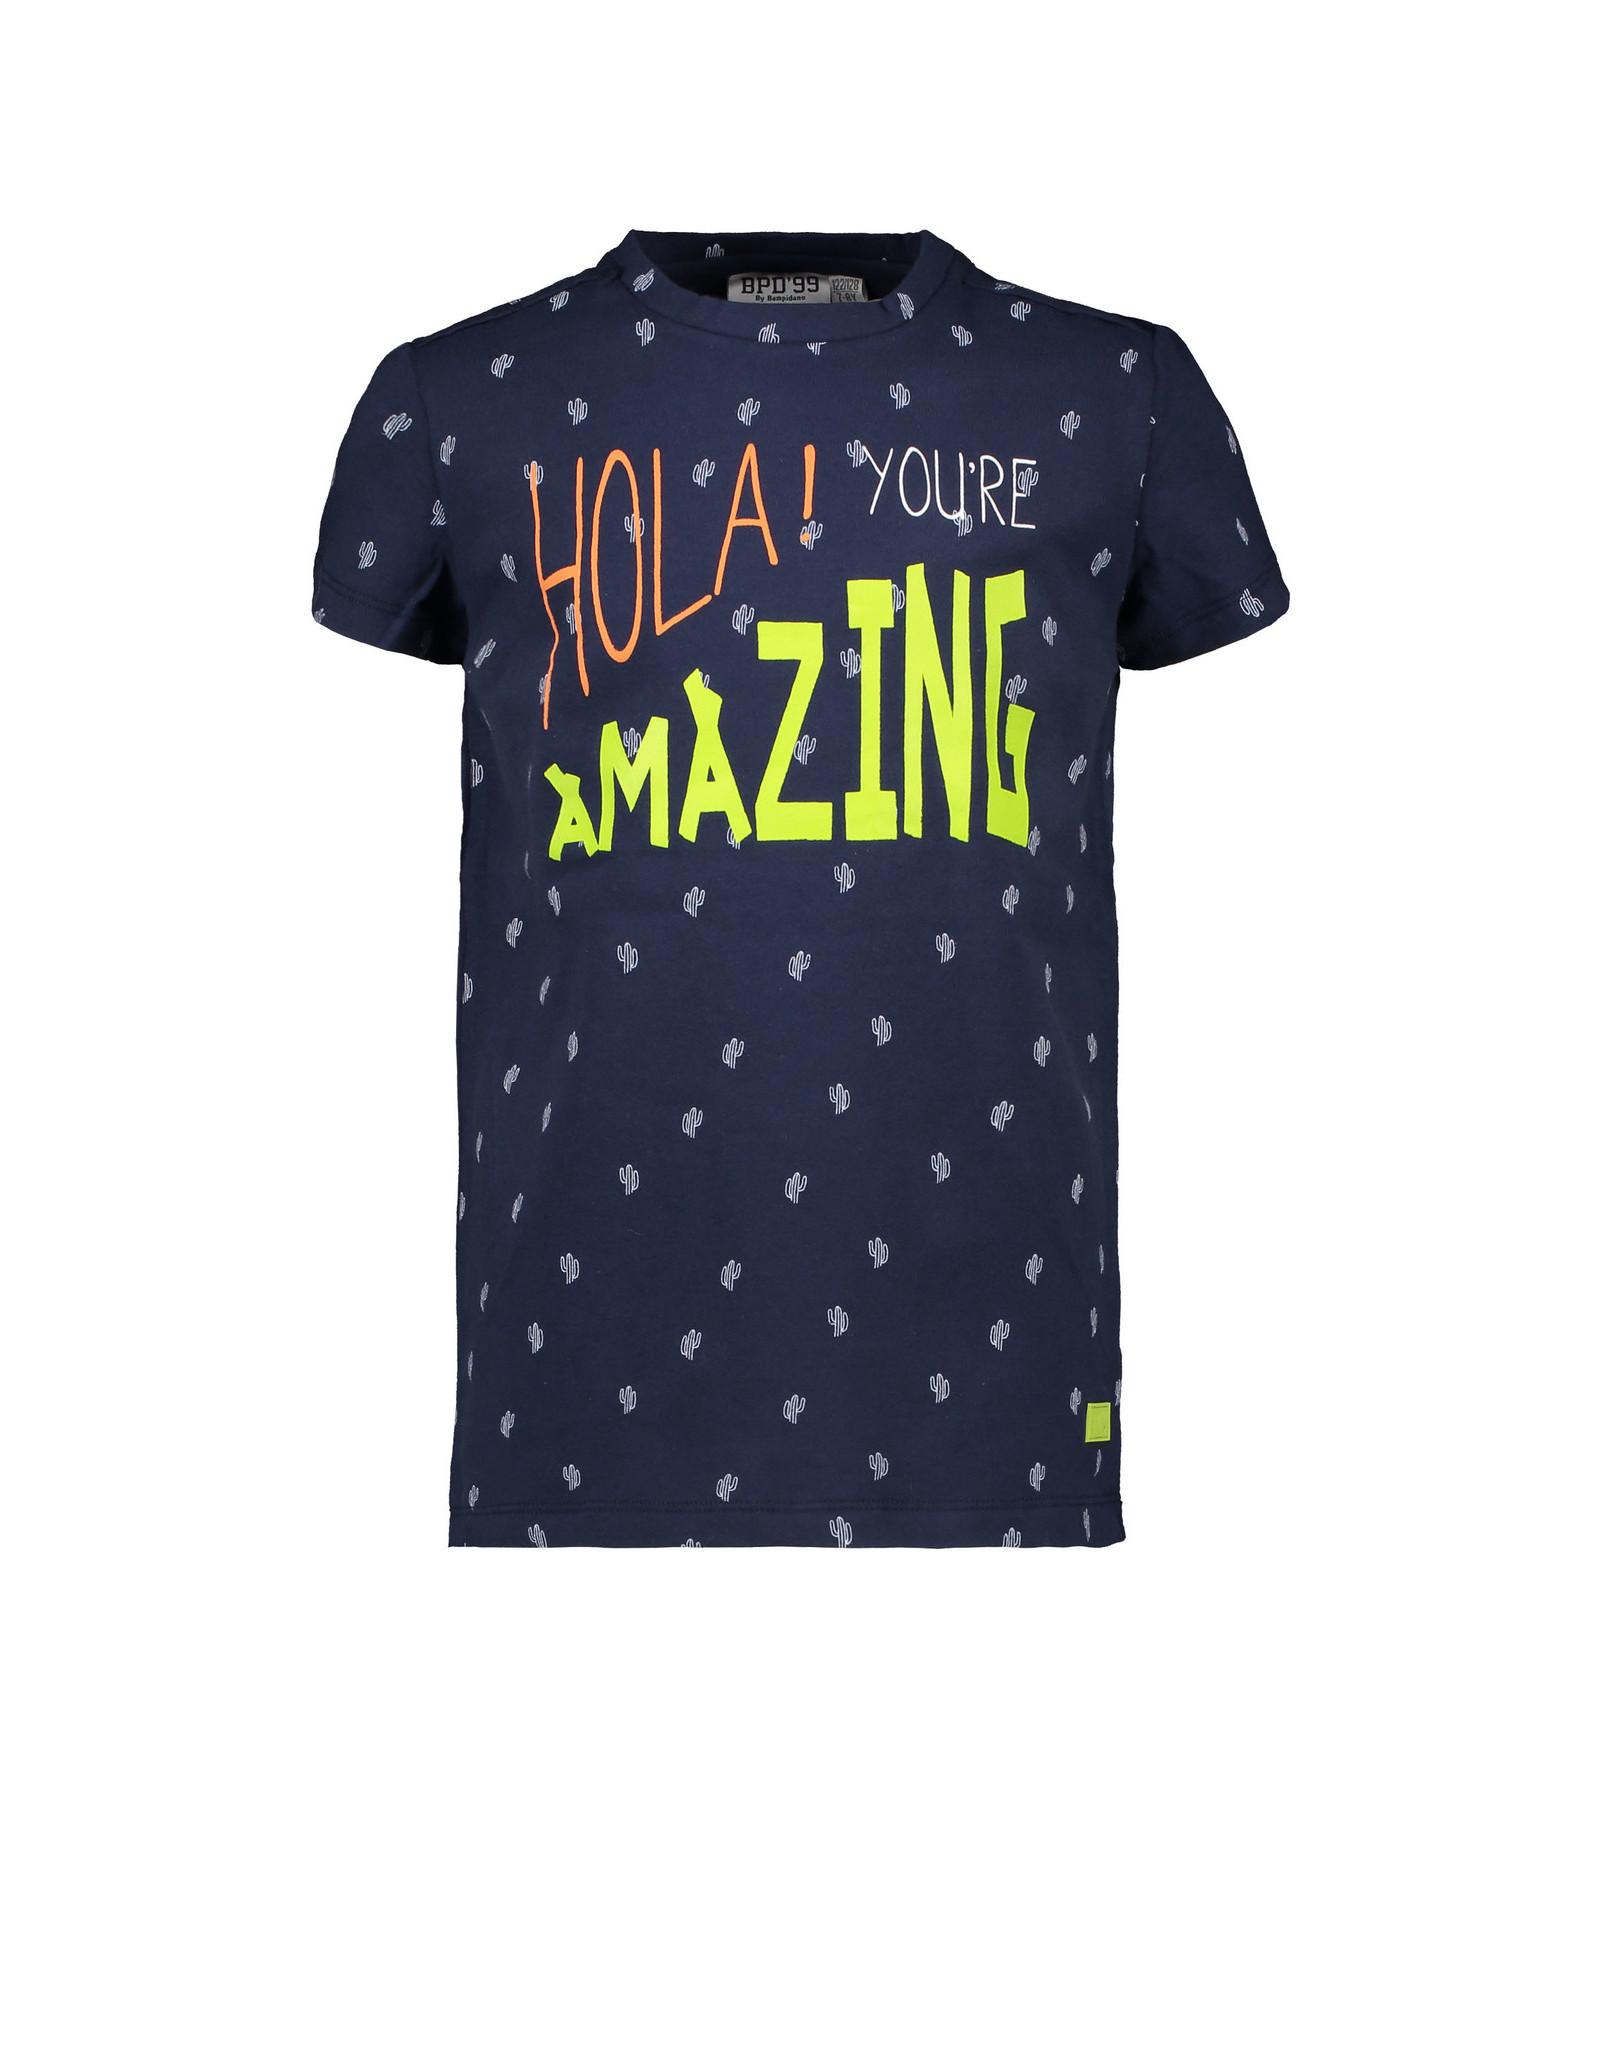 Bampidano Kids Boys T-shirt s/s allover print HOLA! YOU'RE AMAZING, navy allover